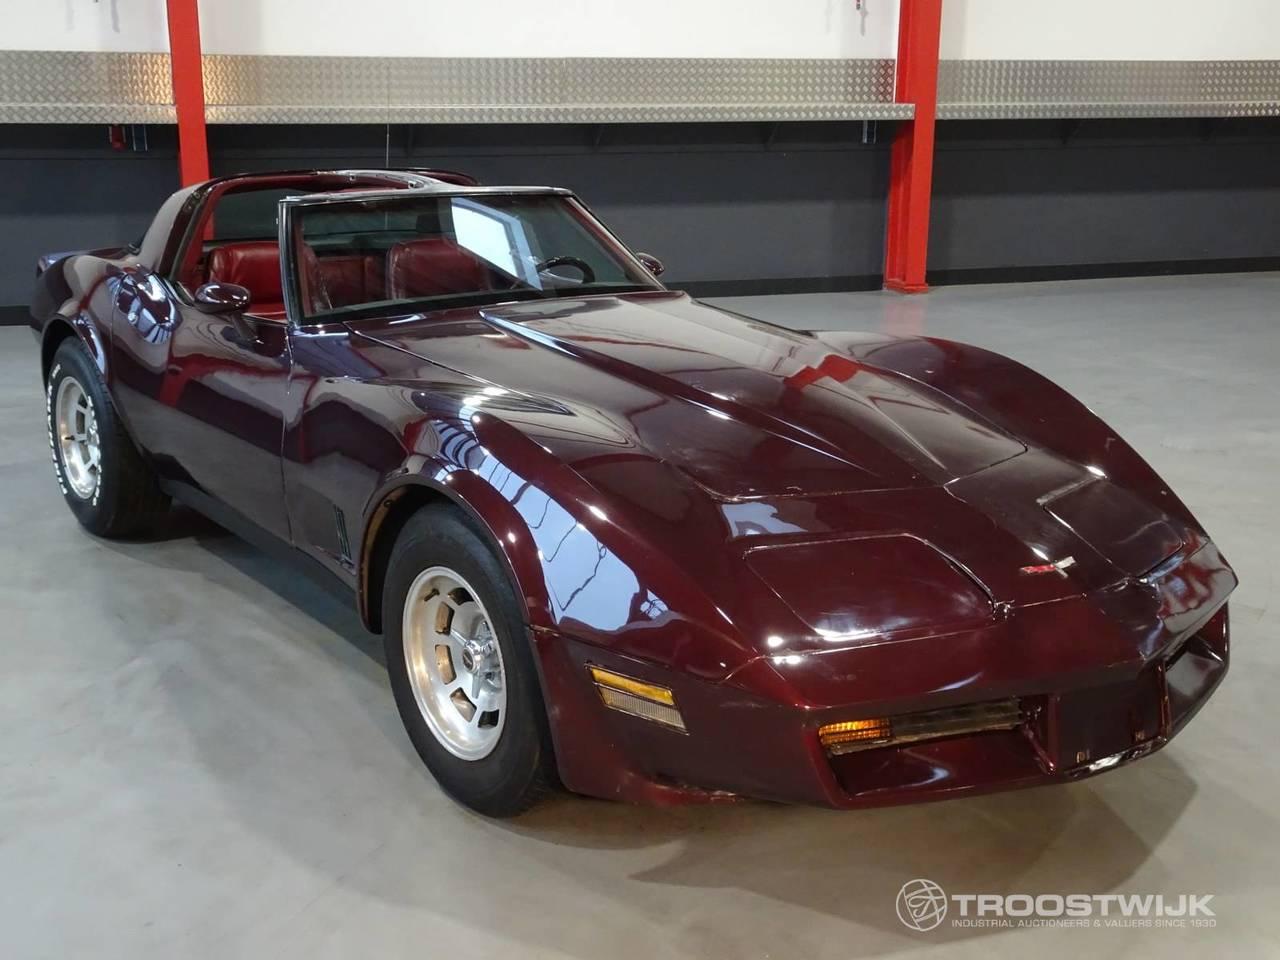 Kekurangan Corvette V8 Spesifikasi